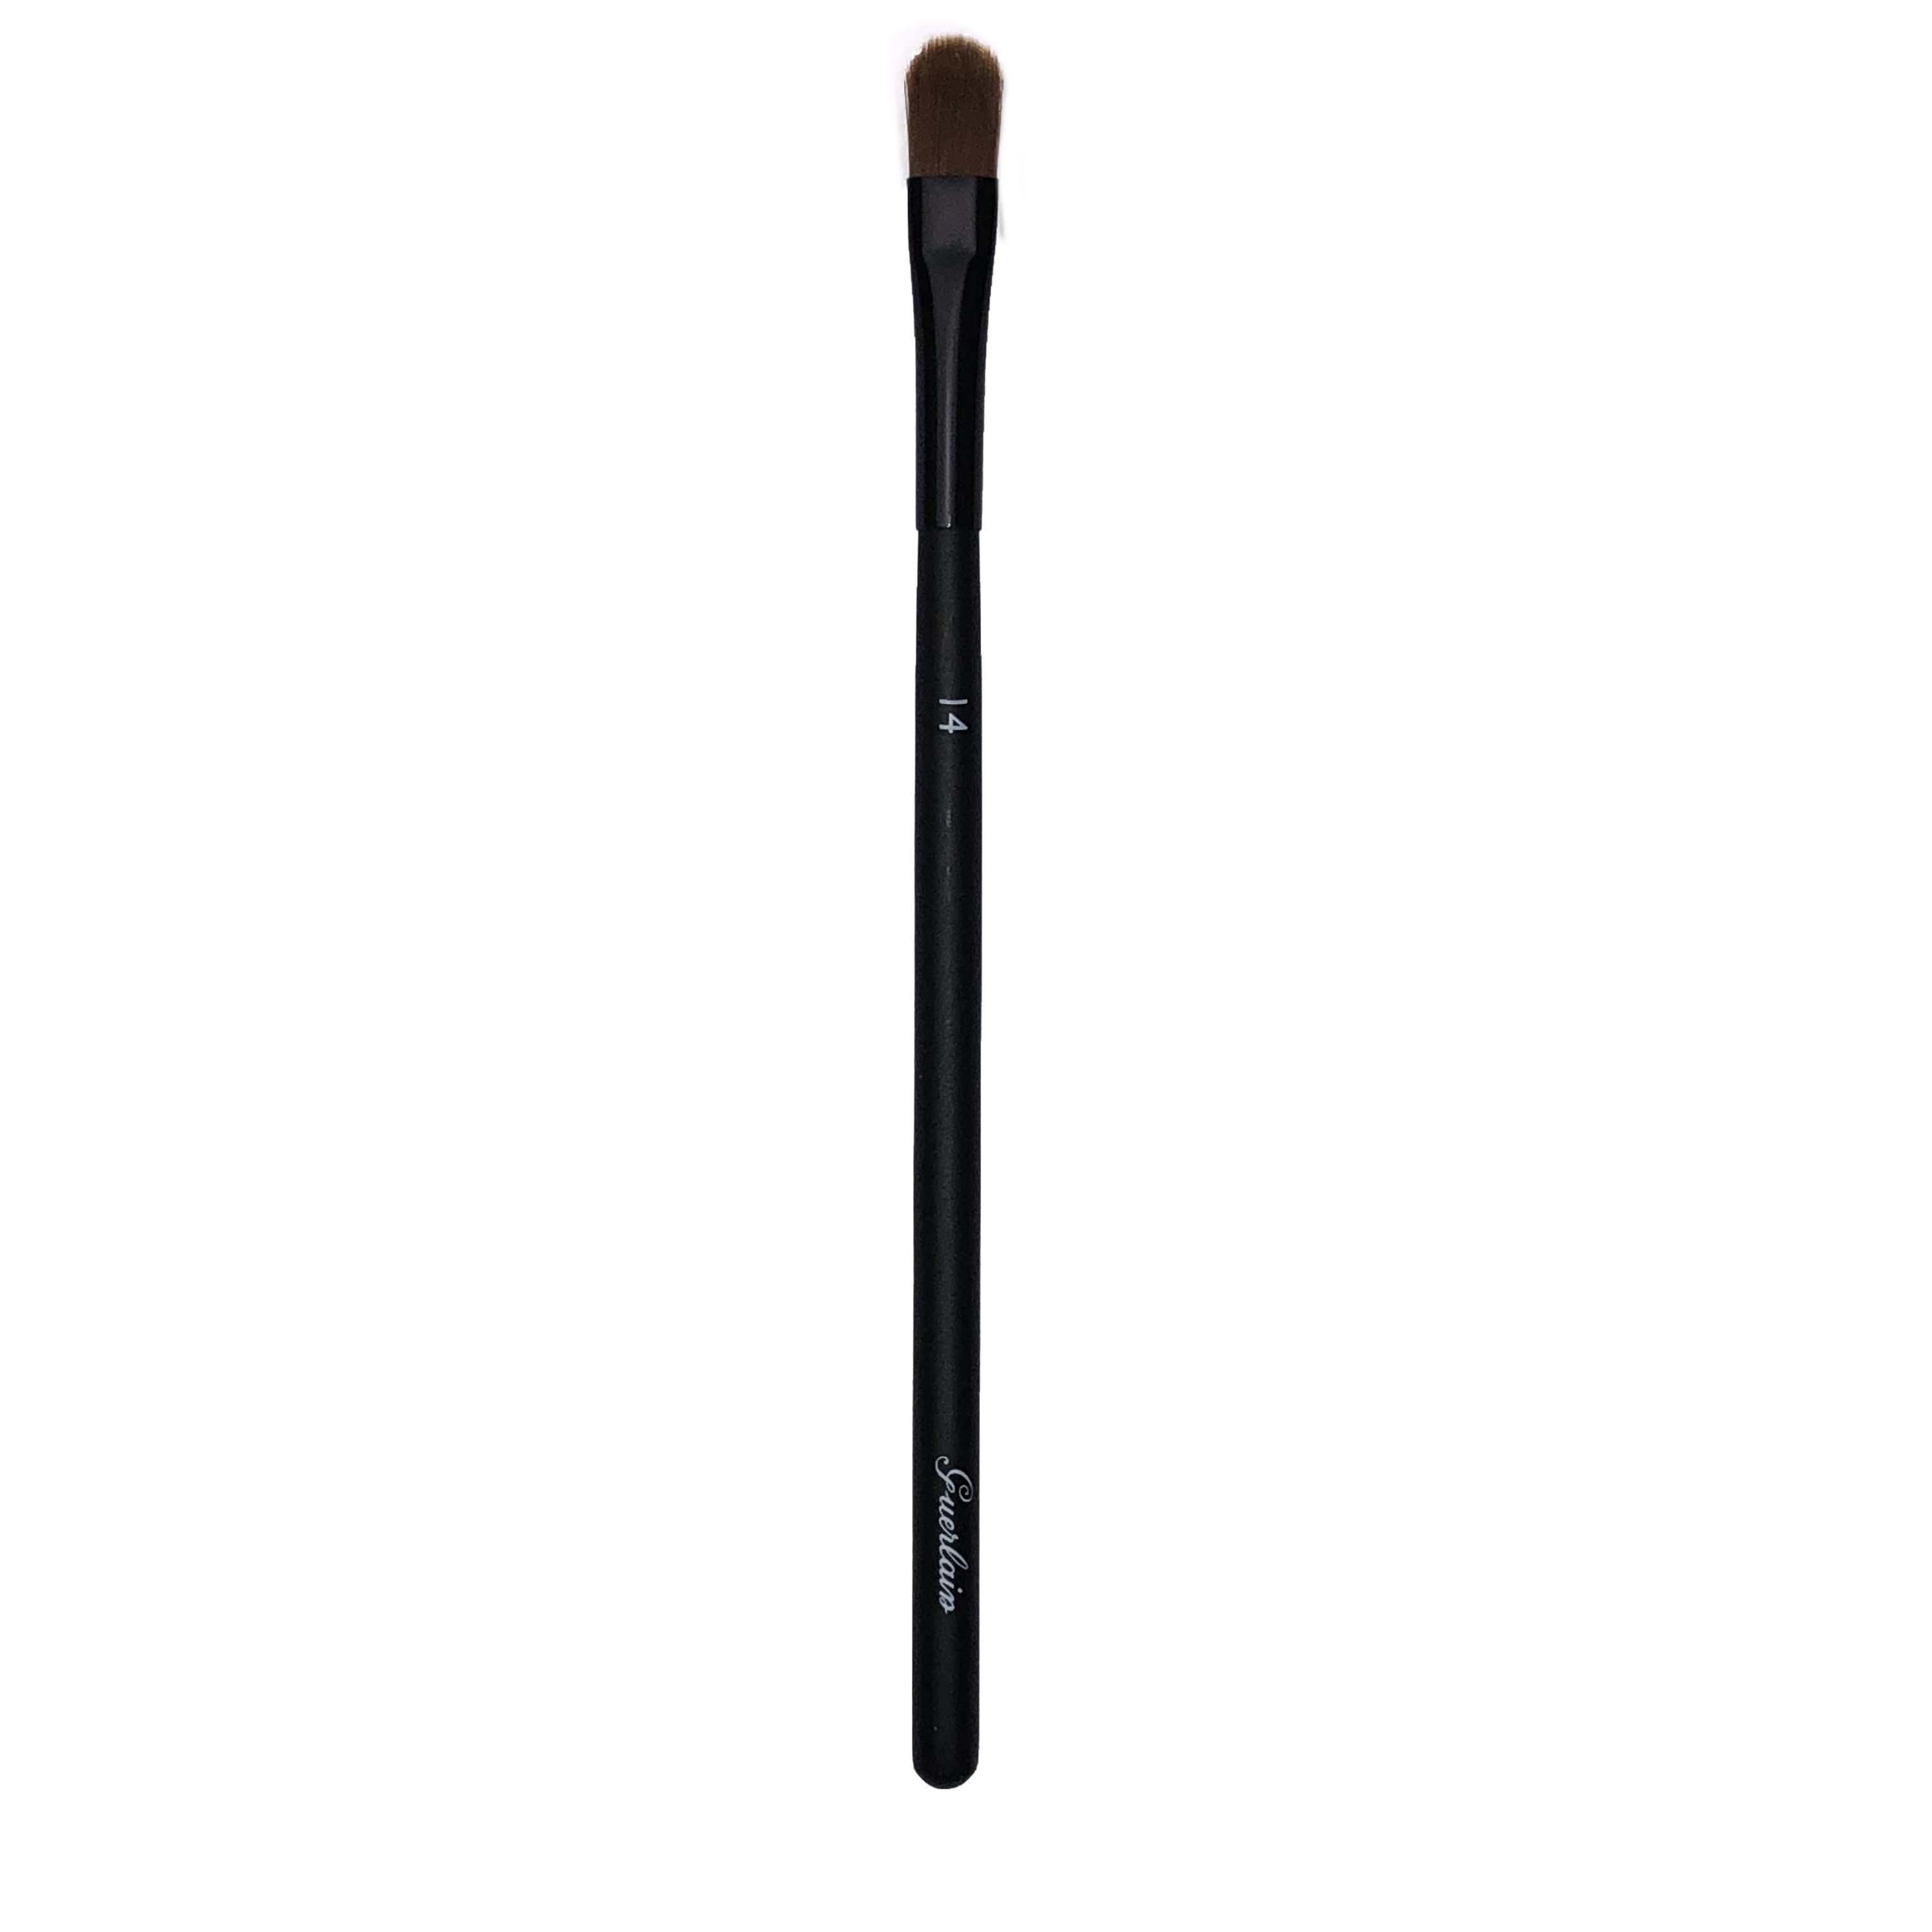 Guerlain Long Bristle Applicator Brush 14 Classic Black